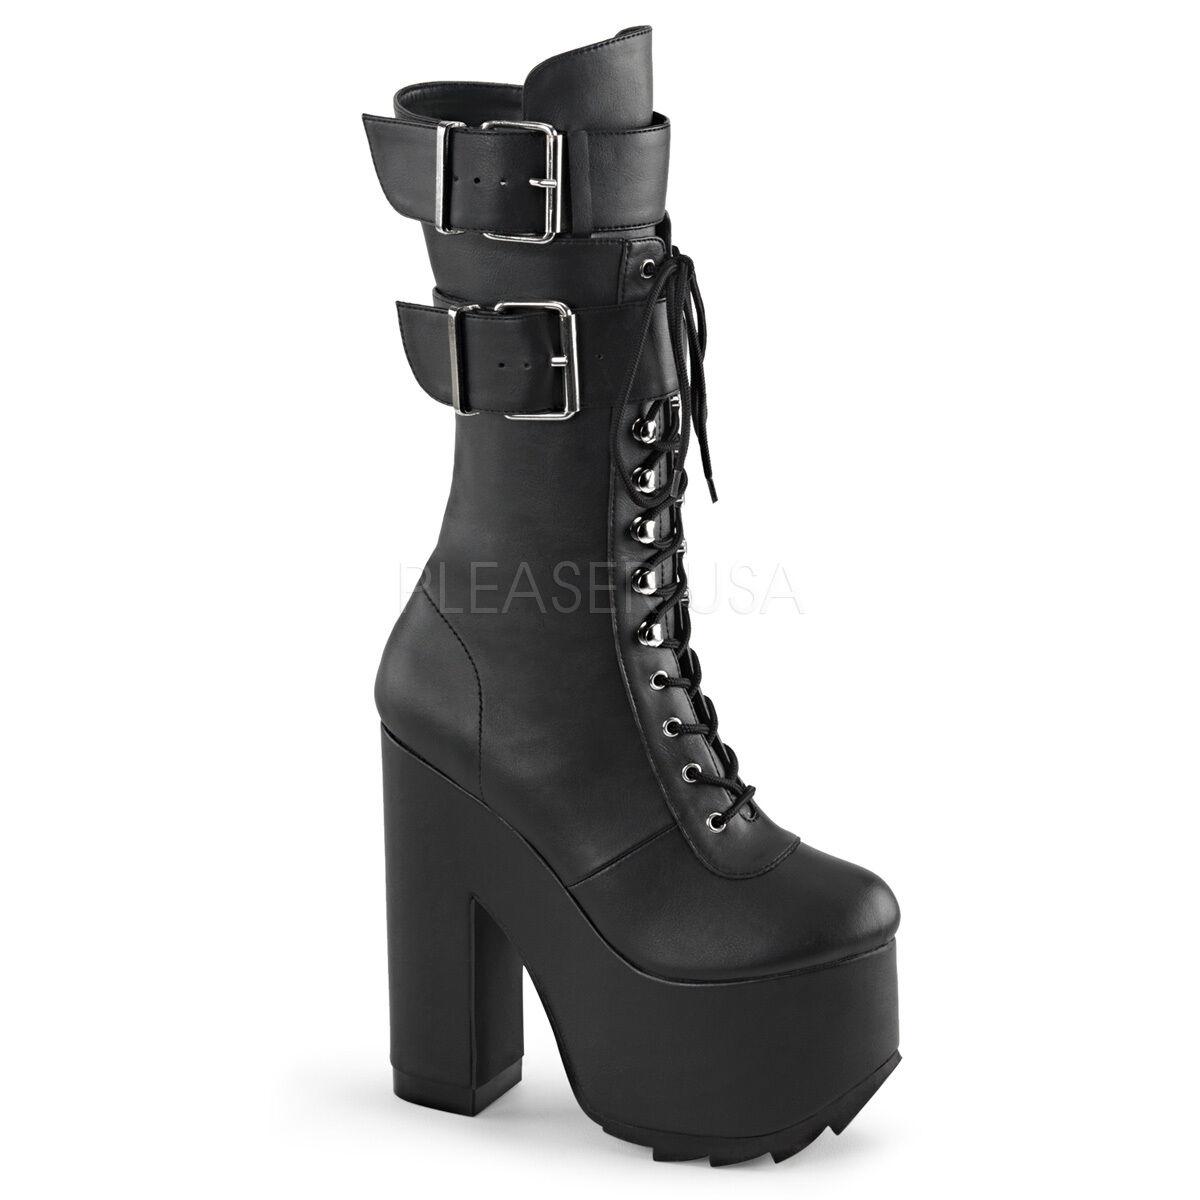 Demonia Demonia Demonia CRAMPS-200 202 Womens Platform Knee Boots aa7920